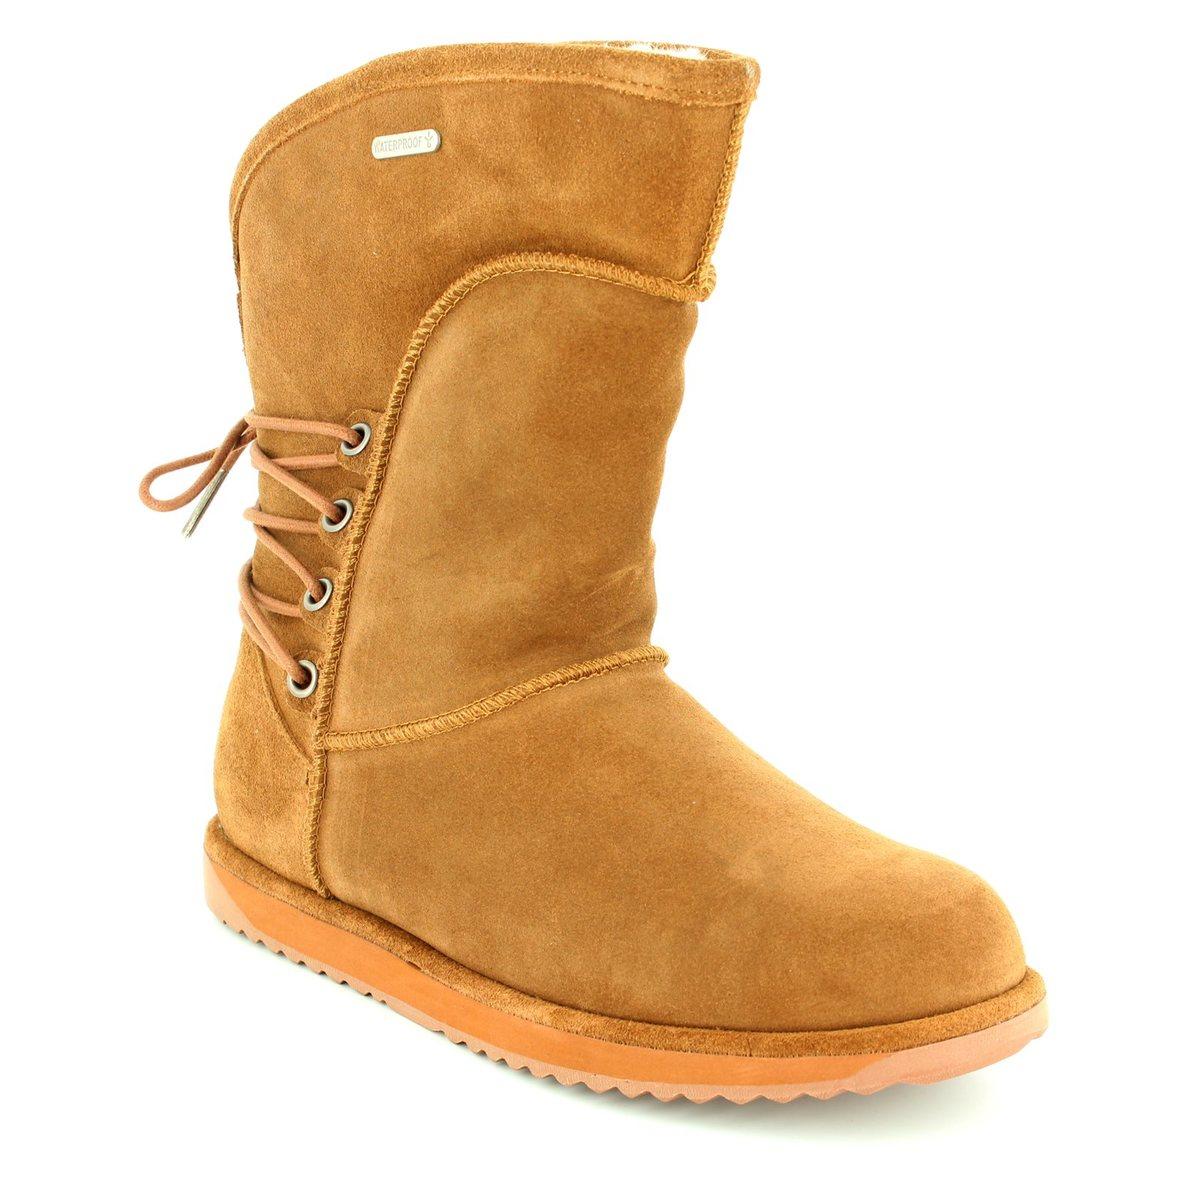 09d987df7c EMU Australia Ankle Boots - Tan suede - W11245/20 ISLAY